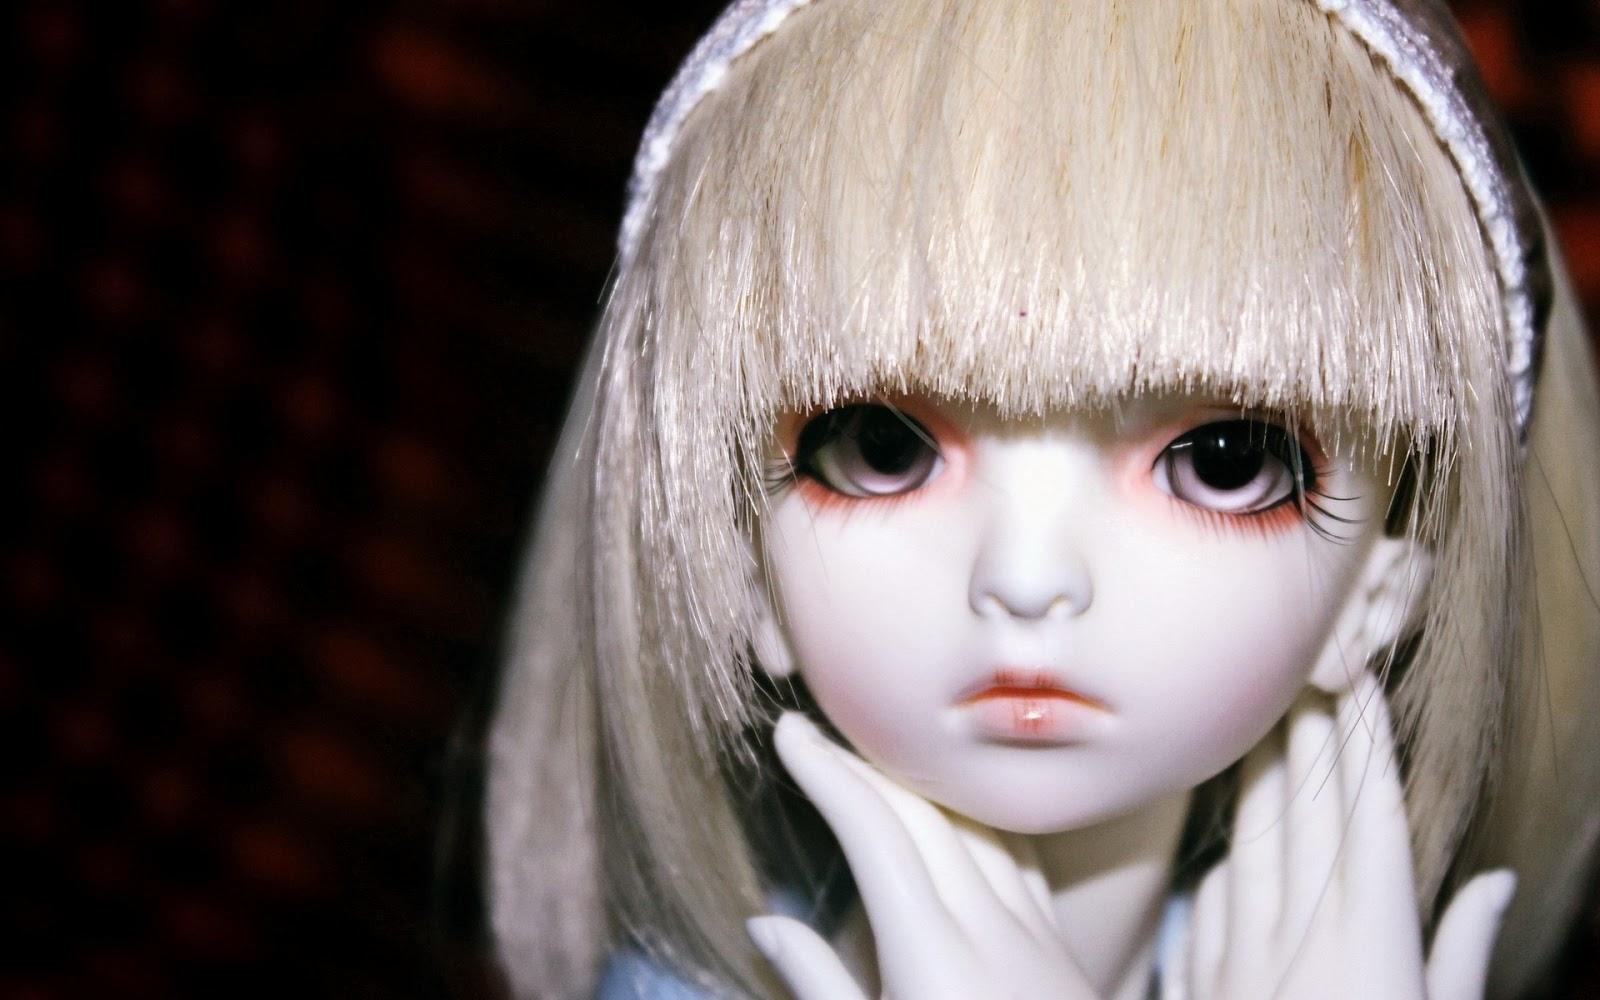 barbie doll wallpapers girl desktop photos pictures